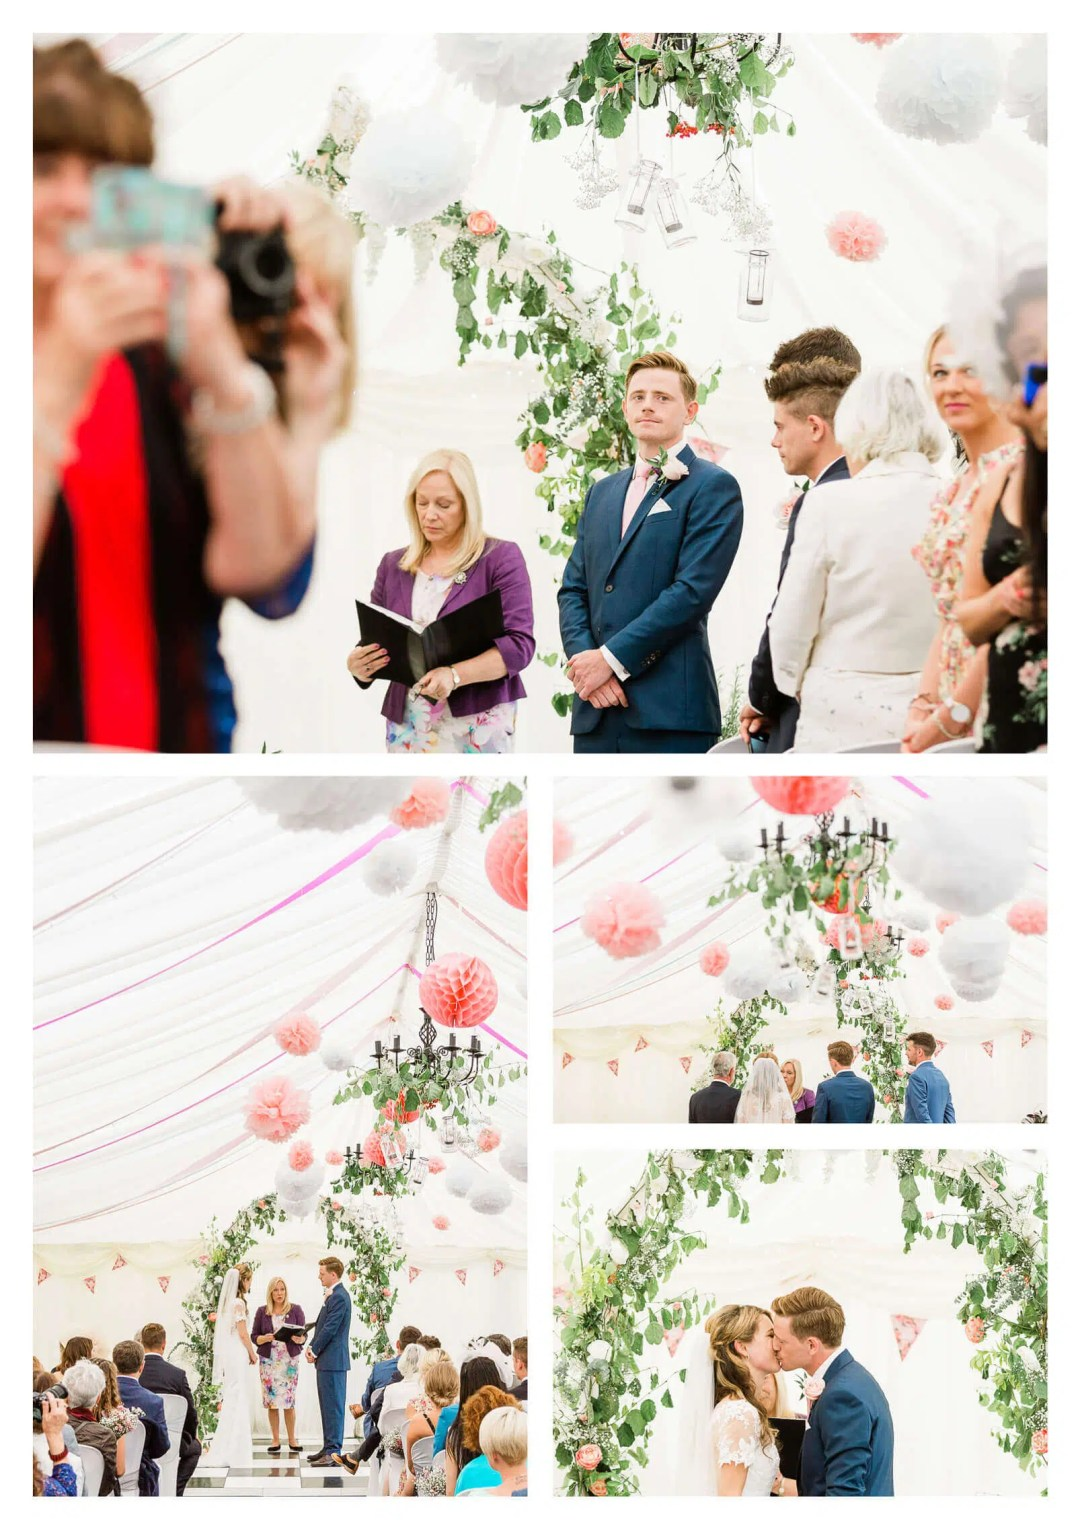 Anchor Inn wedding venue ceremony in marquee | Lewes wedding photographer